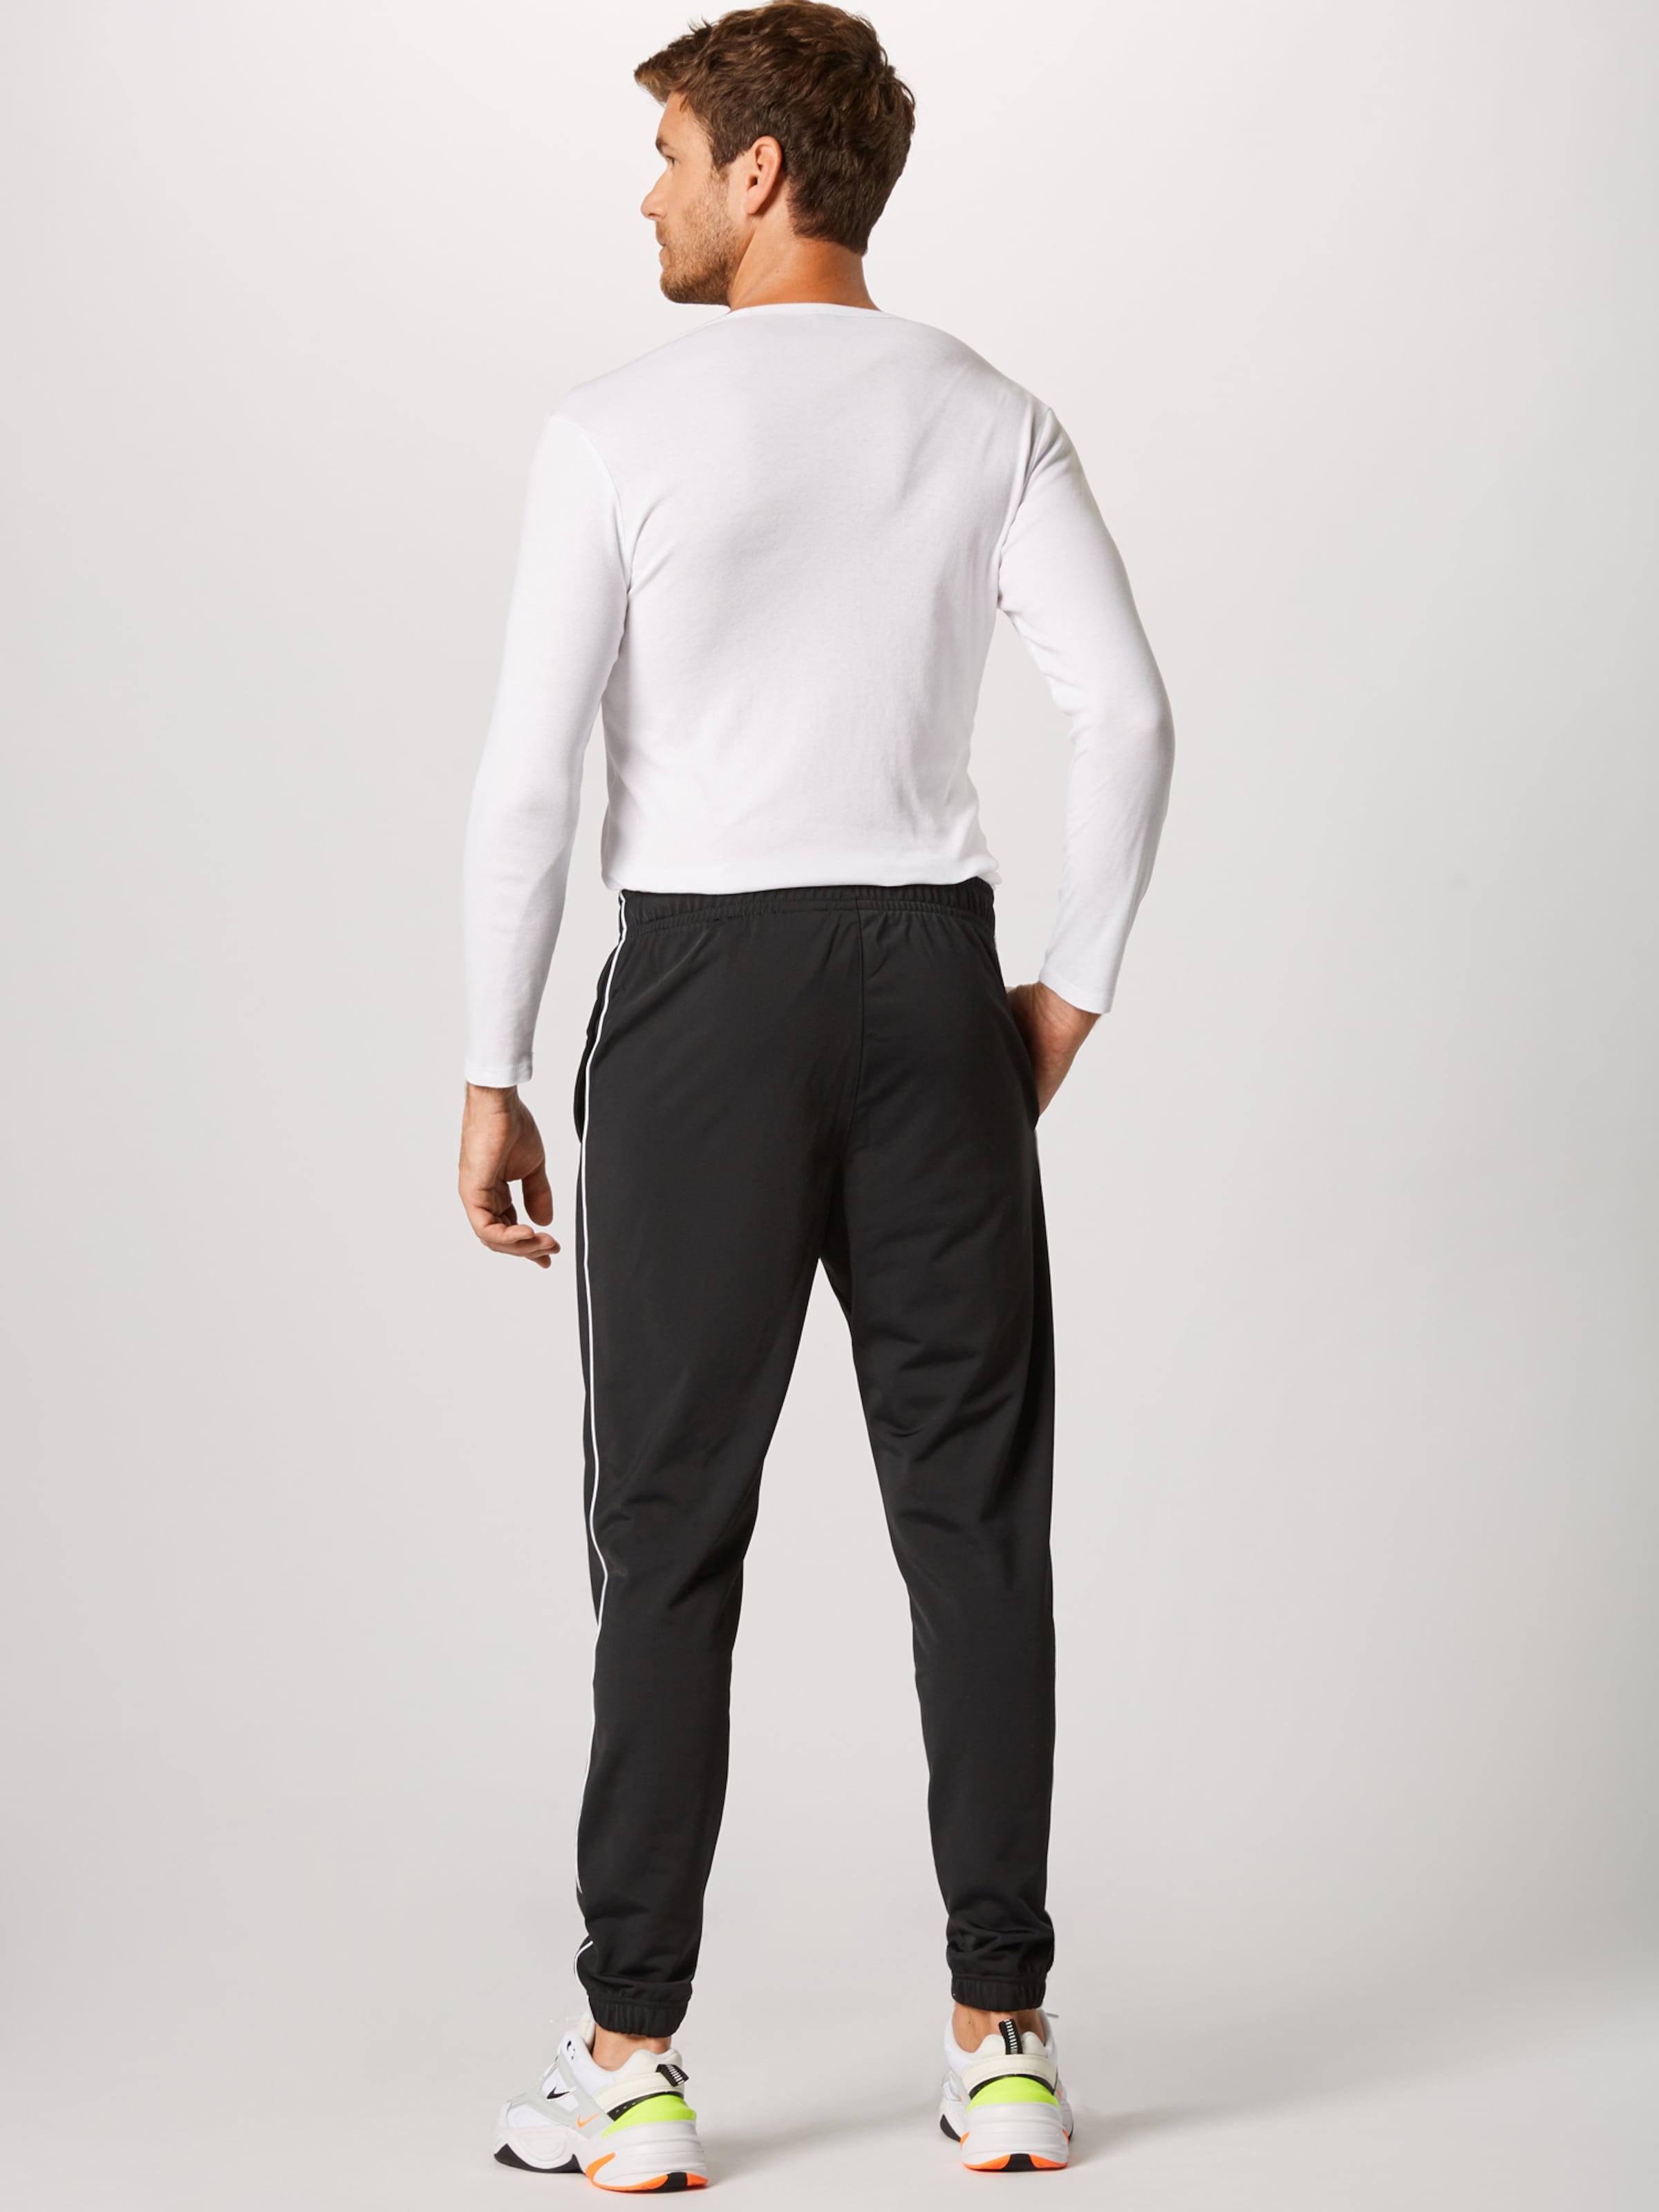 Tenue Trk D'intérieur Suit Sportswear Noir En Ce Nike Basic' Nsw Pk 'm lwPuTiOkXZ